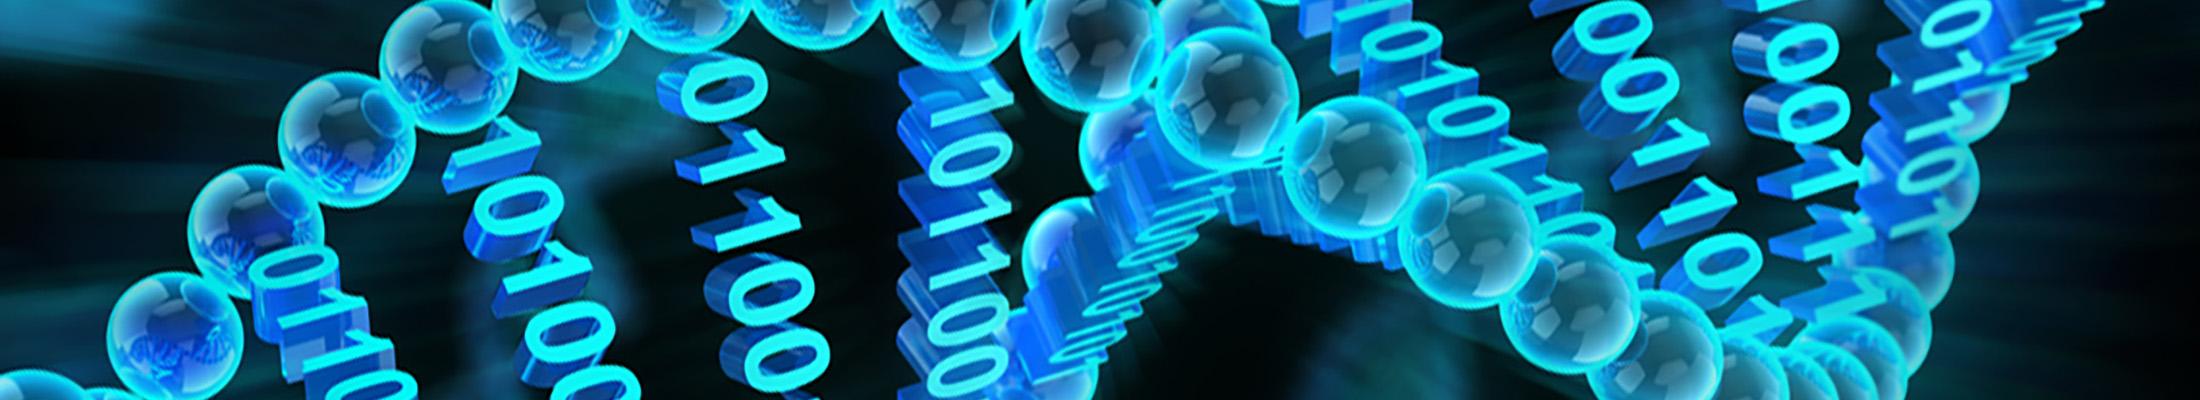 Bioinformatics banner image